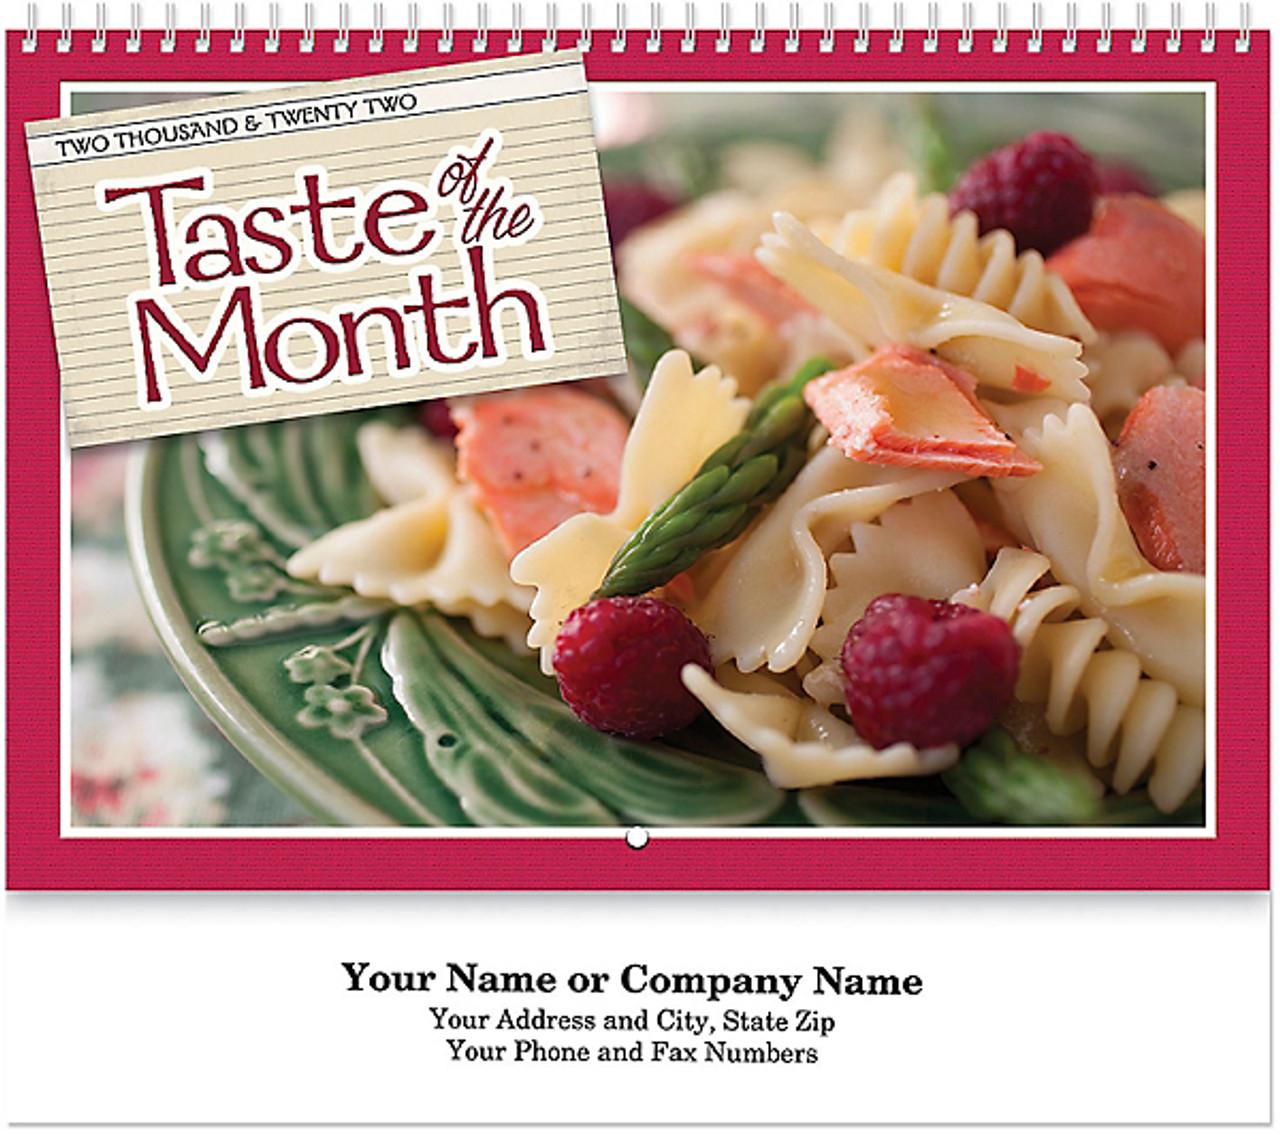 Taste of the Month Wall Calendar